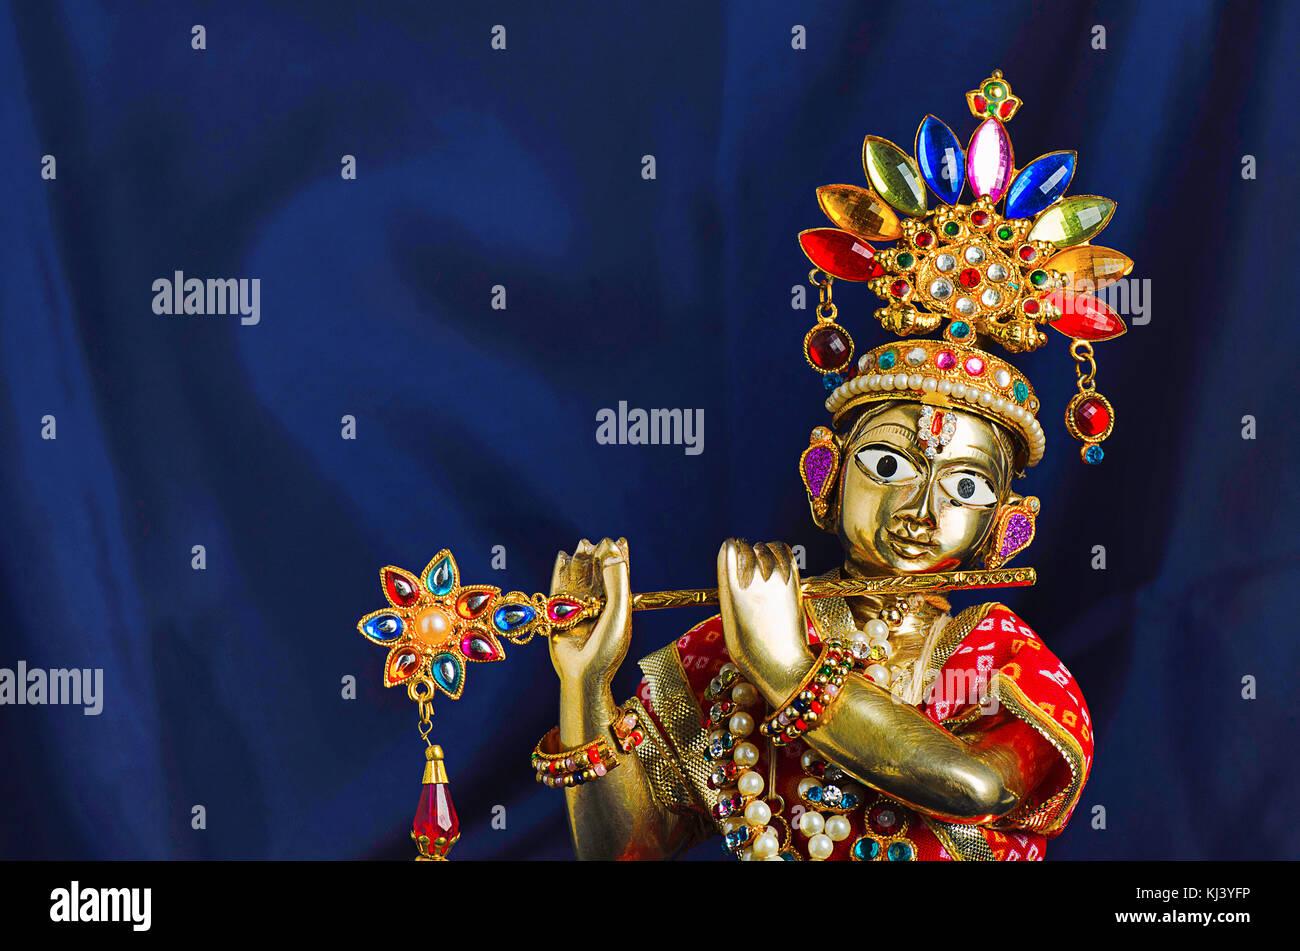 Krishna Cow Flute Stock Photos & Krishna Cow Flute Stock